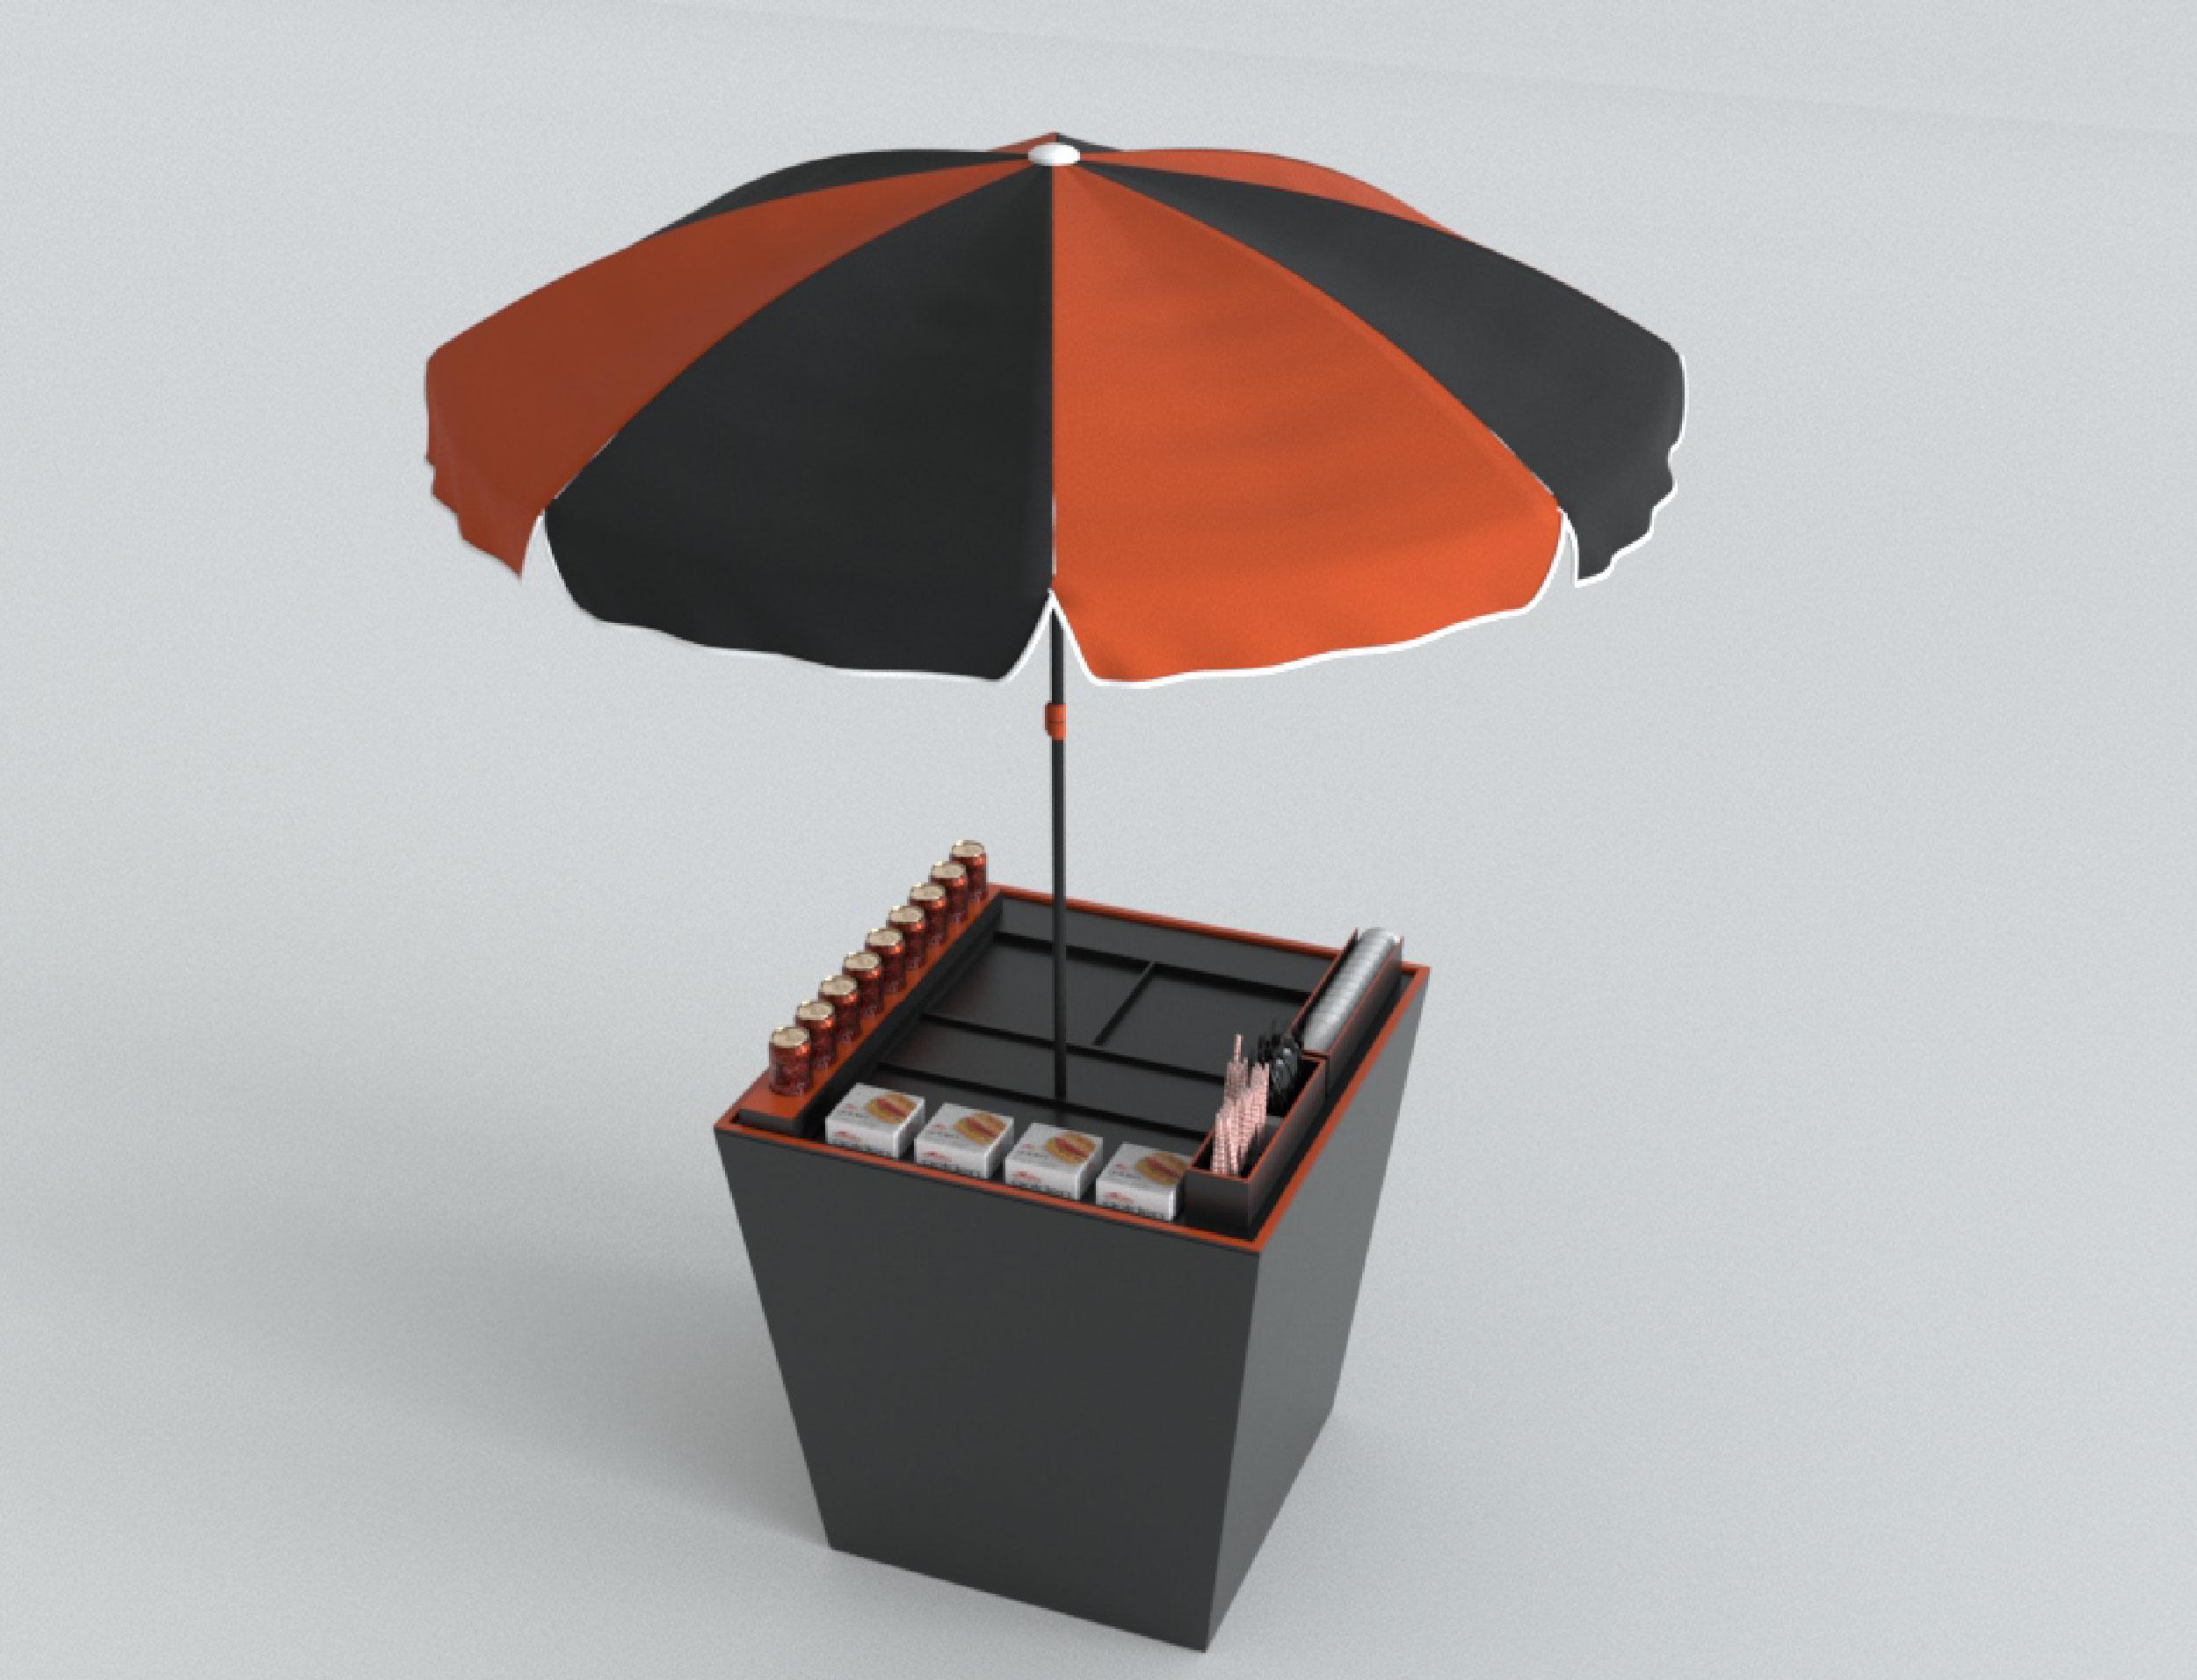 KheloMore Foodcart Design